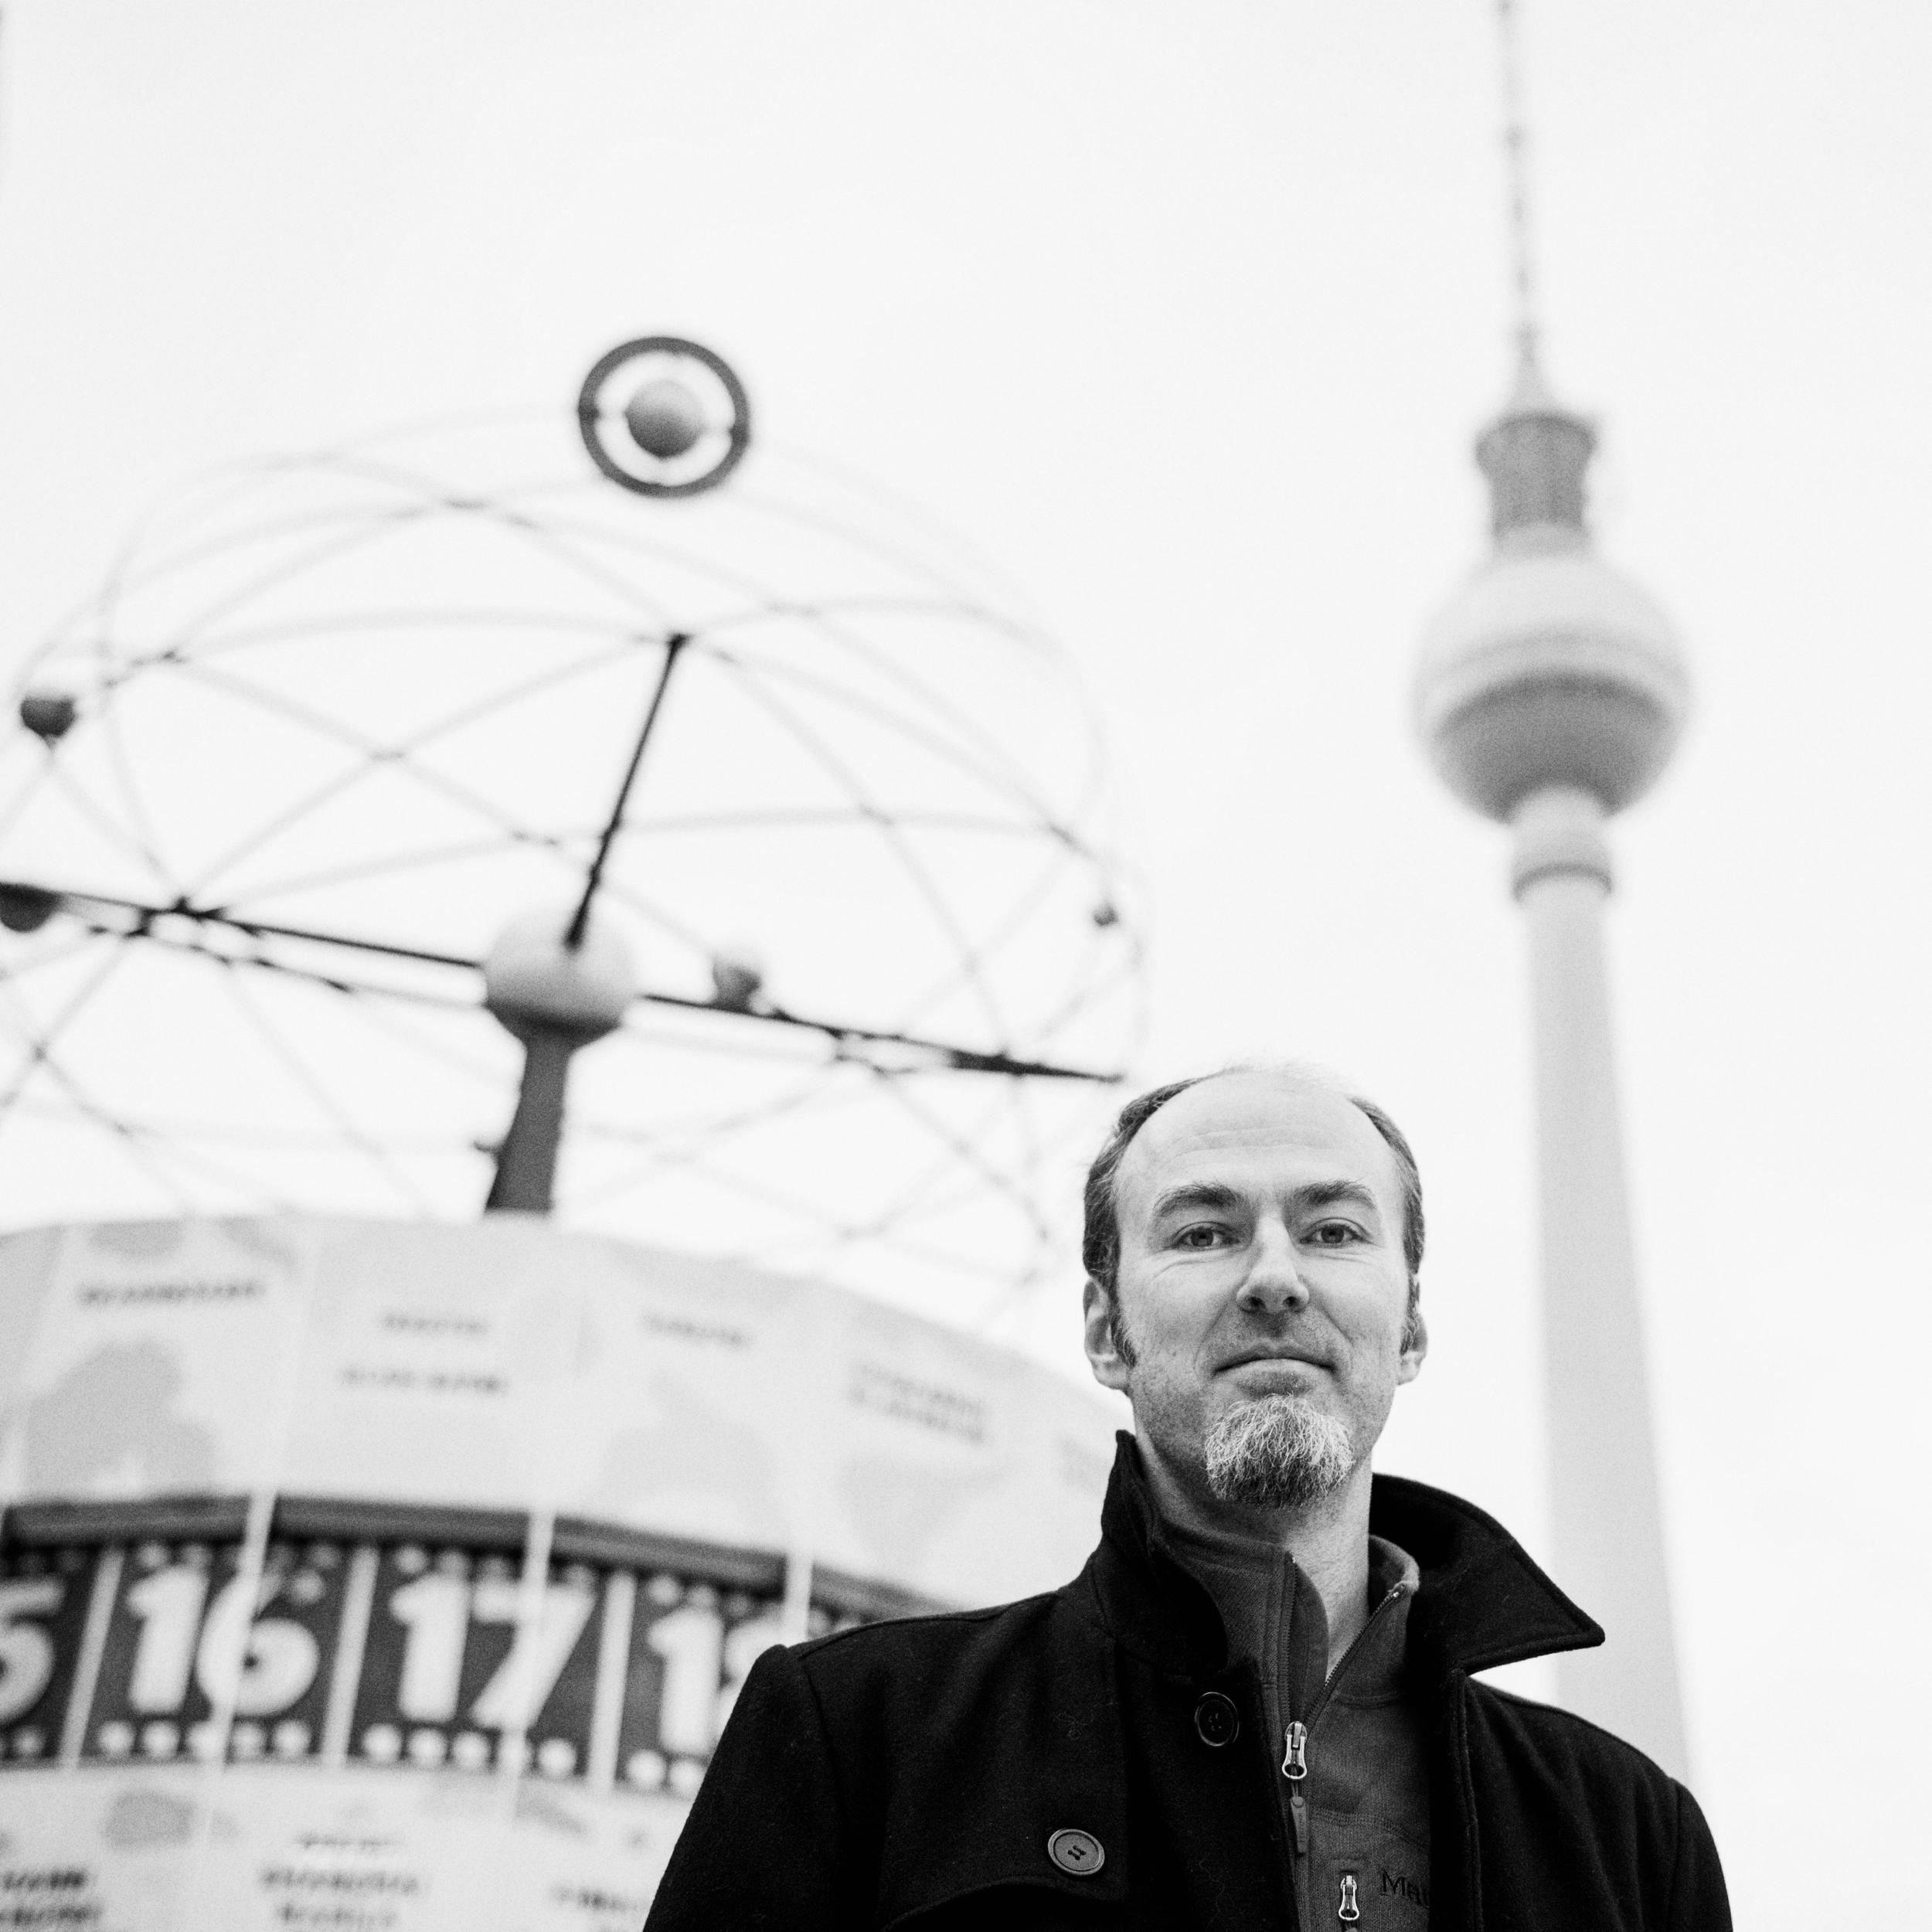 Foto: Milena Schlösser